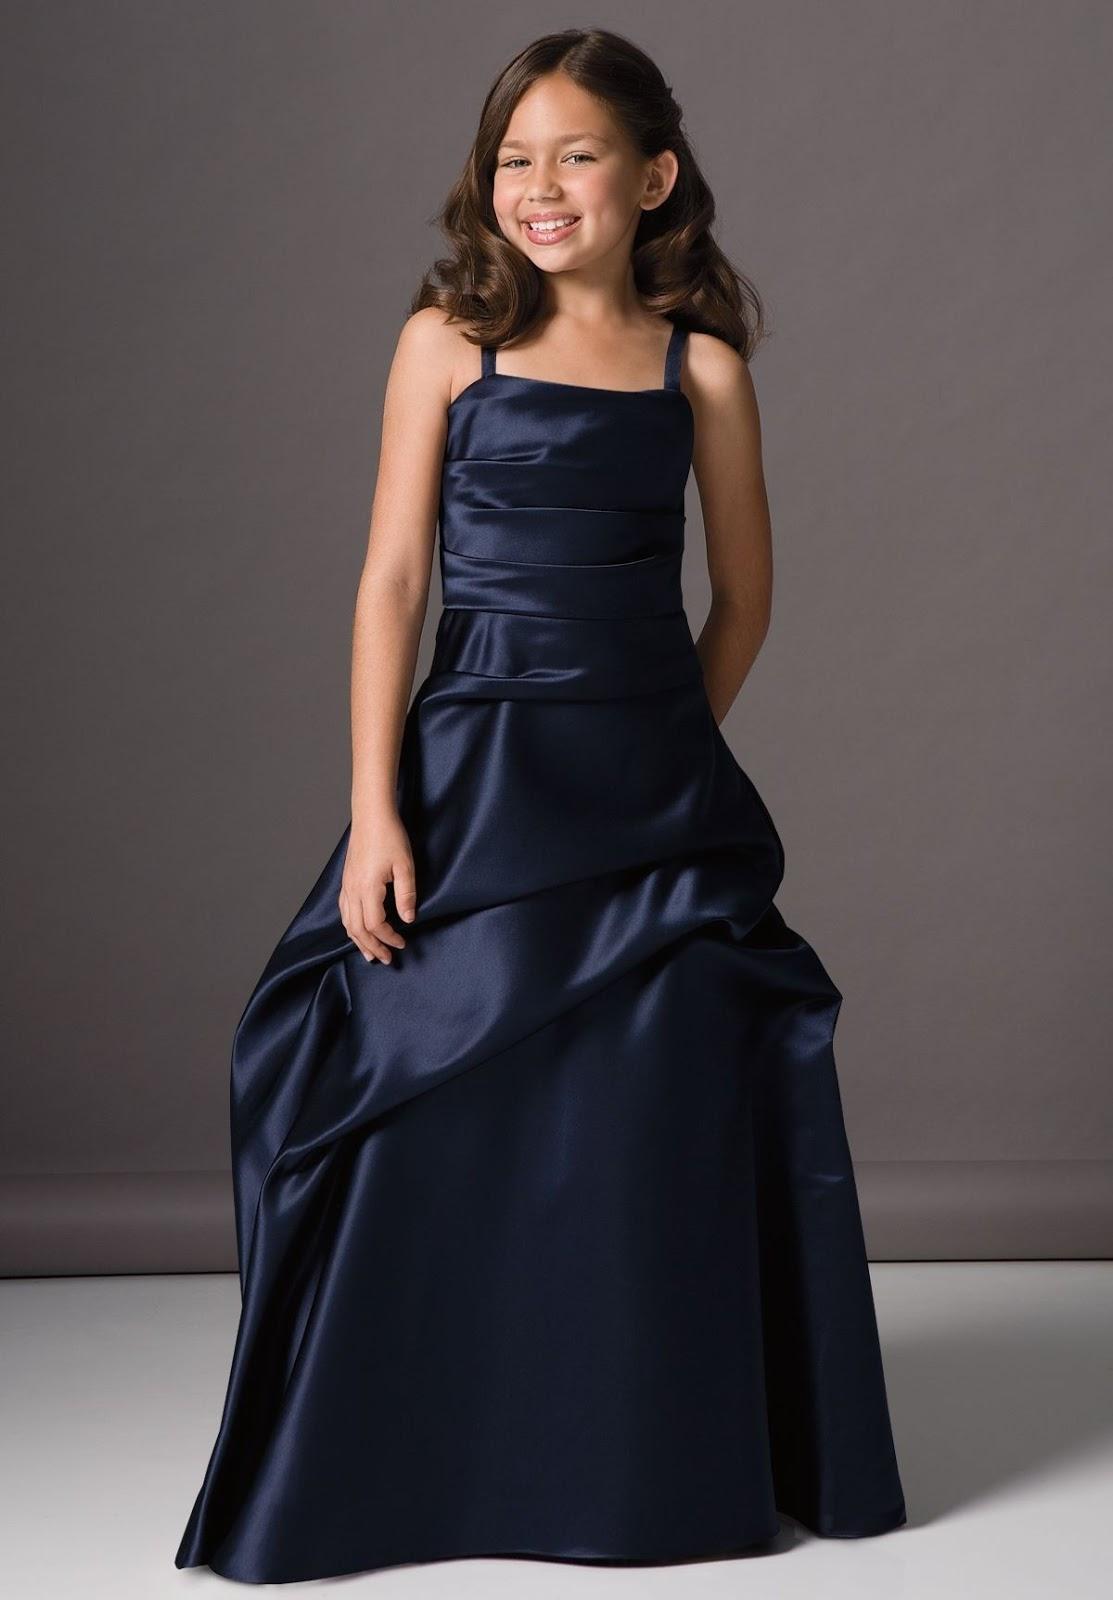 WhiteAzalea Junior Dresses August 2013